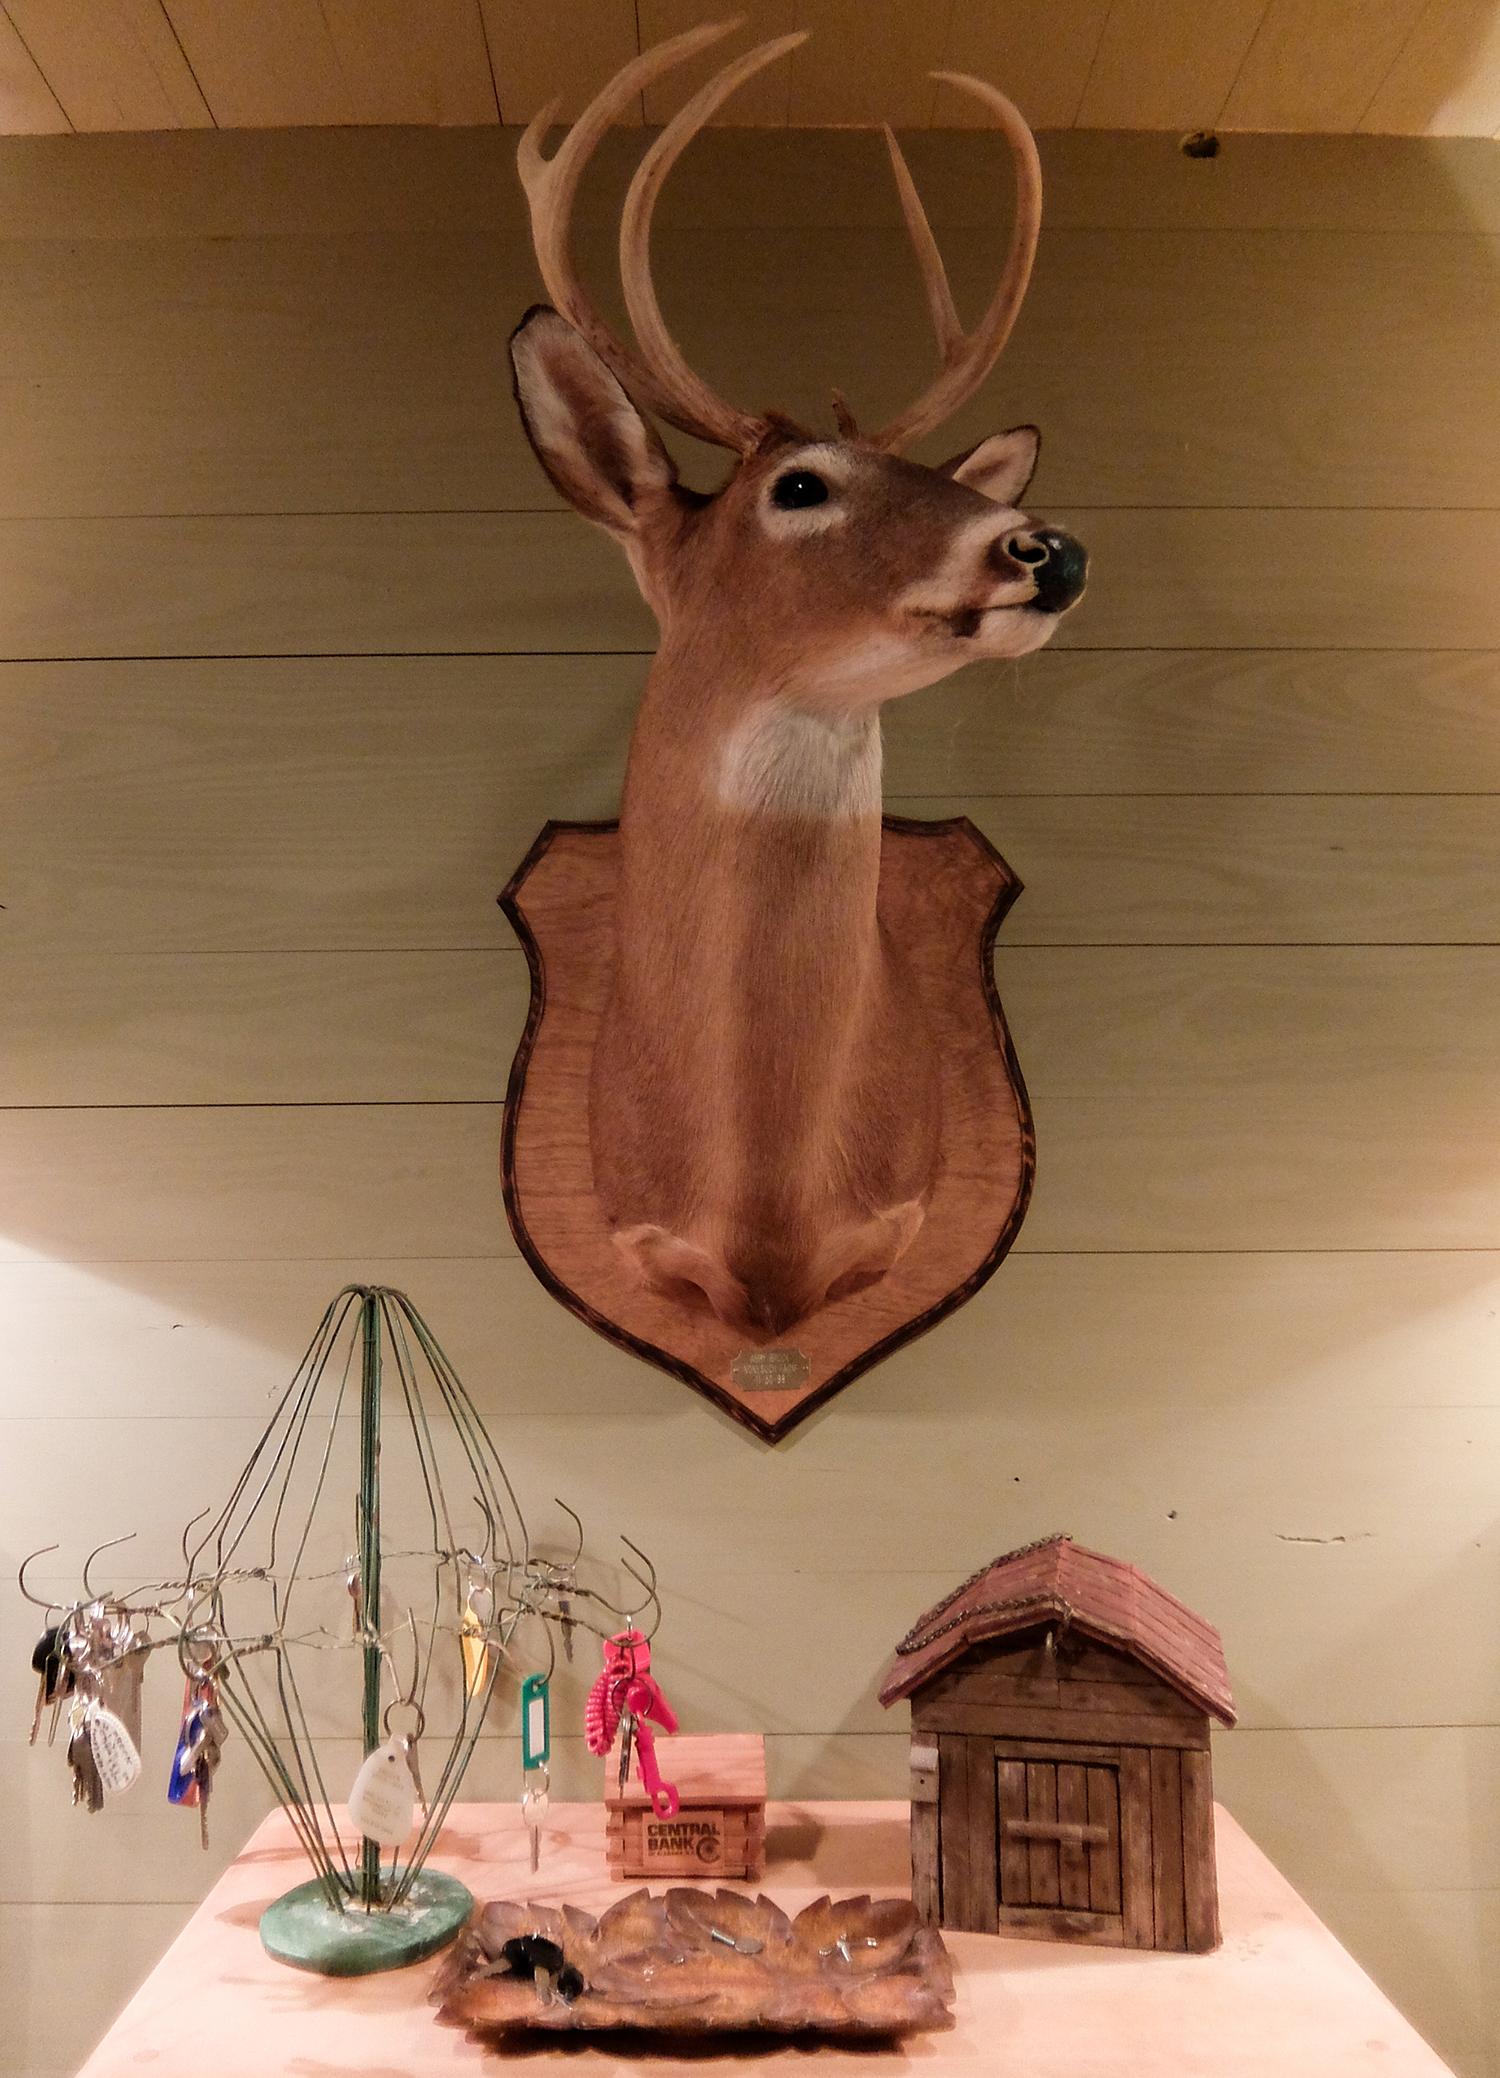 sugar_creek_farm_45_lakehouse_lake_house_hall decor_farmhouse_1500.jpg